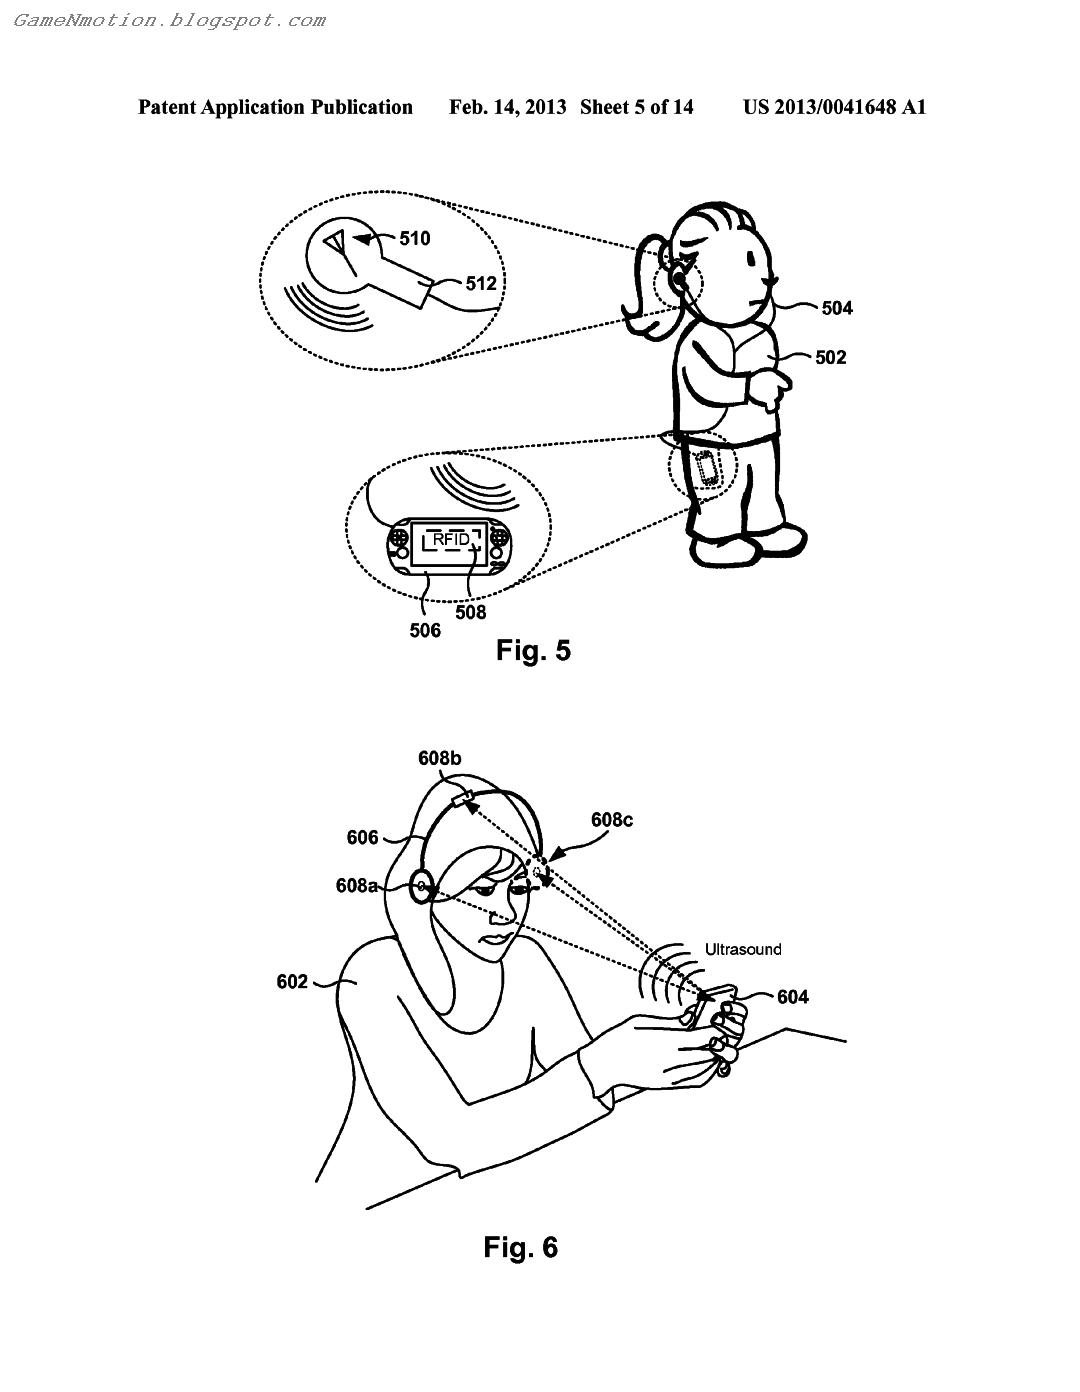 Game N Motion Playstation 4 Controller S Speaker